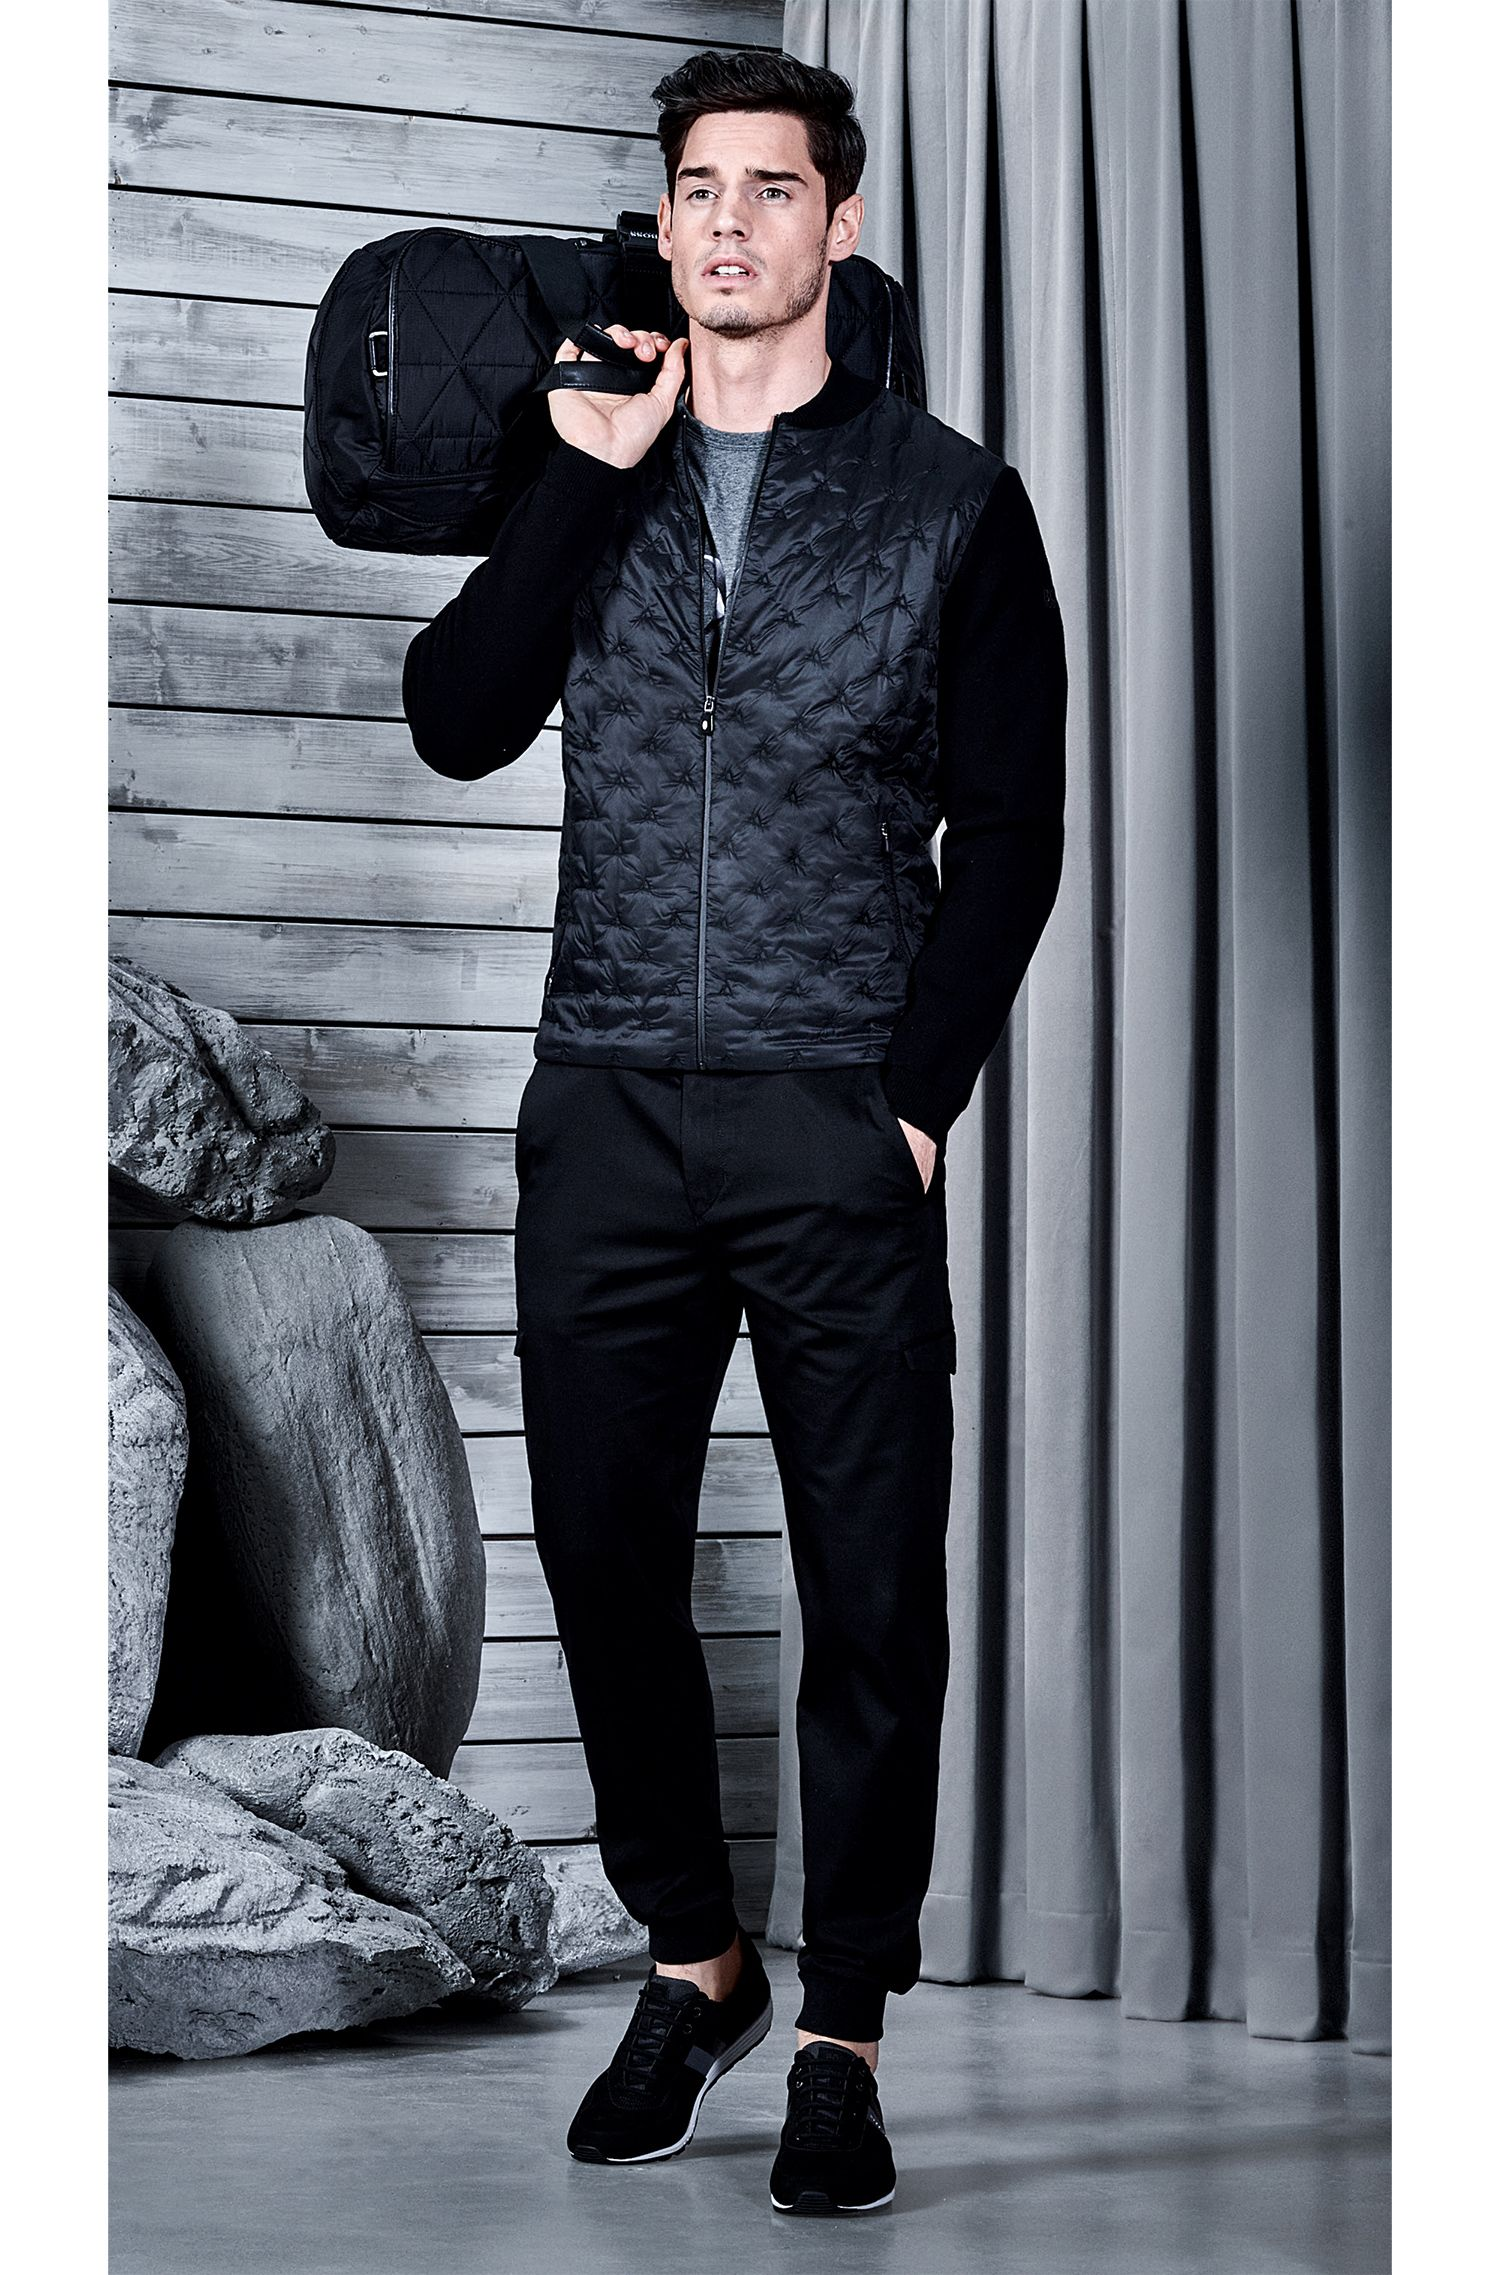 Pintucked Nylon & Cotton Blend Jacket | Zimen, Black